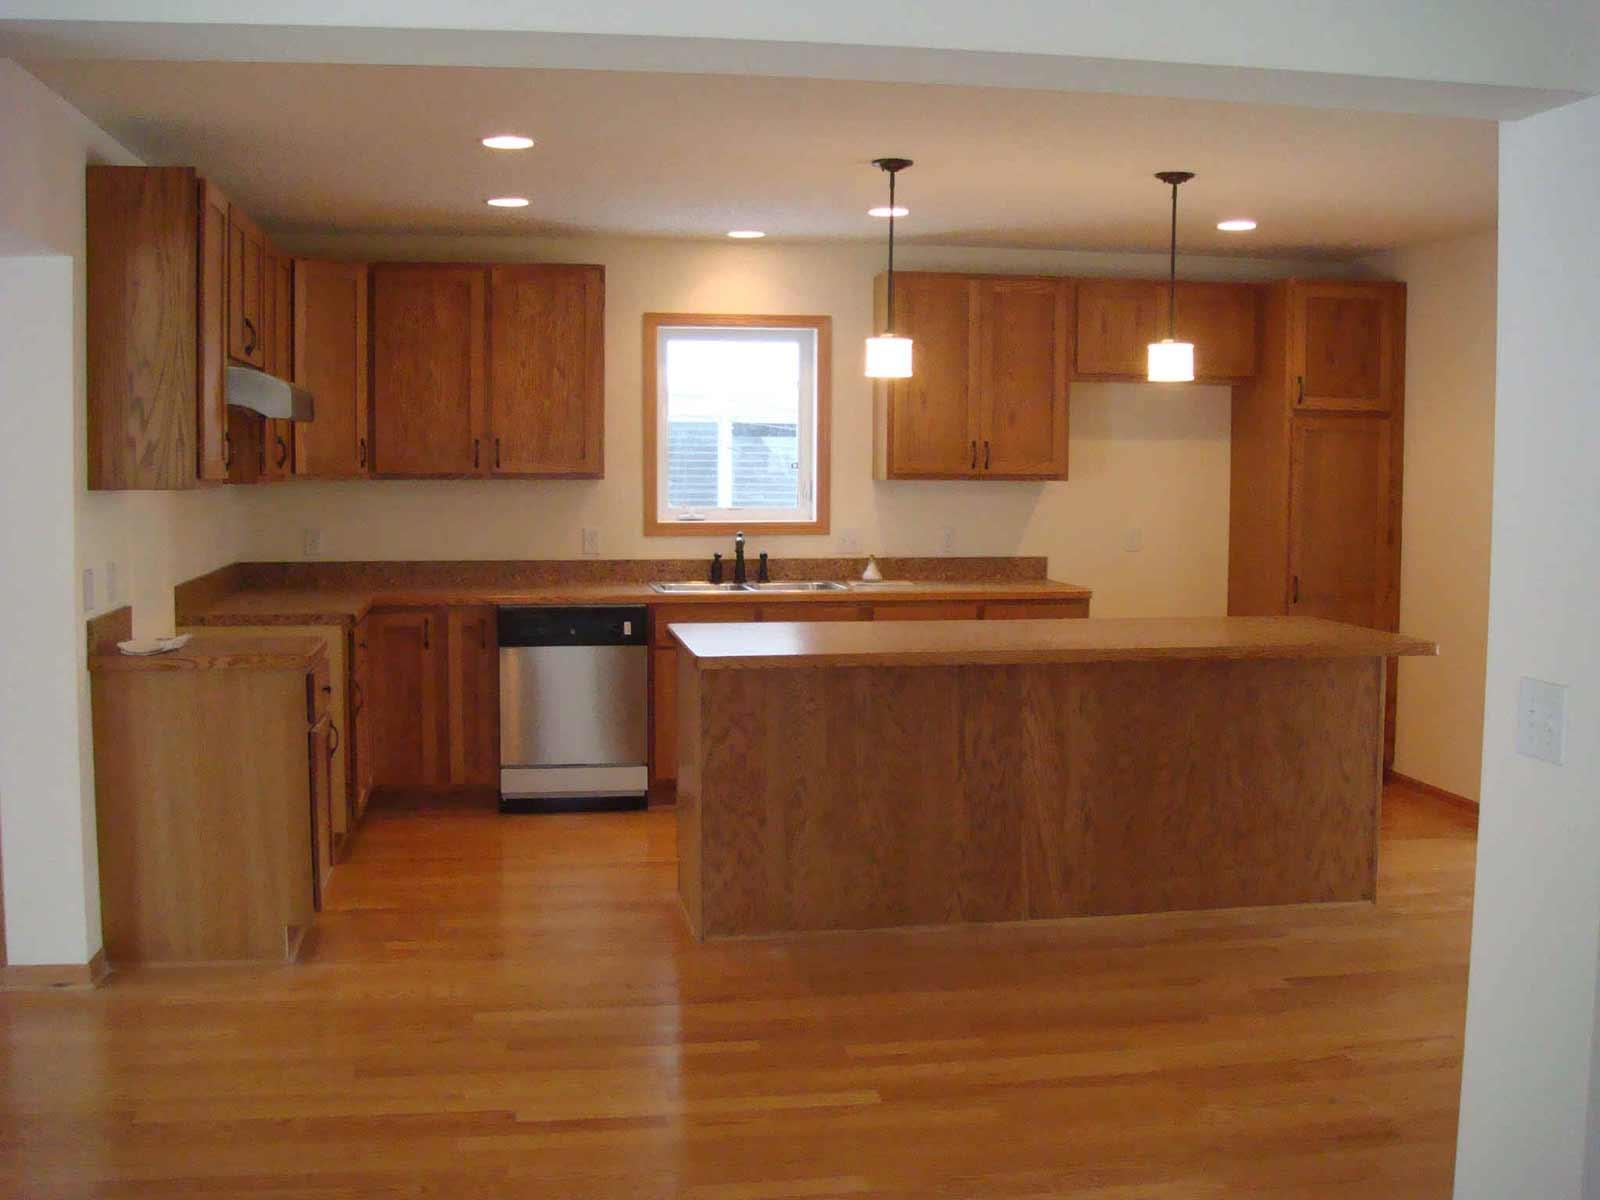 Laminate Wood Flooring For Kitchen